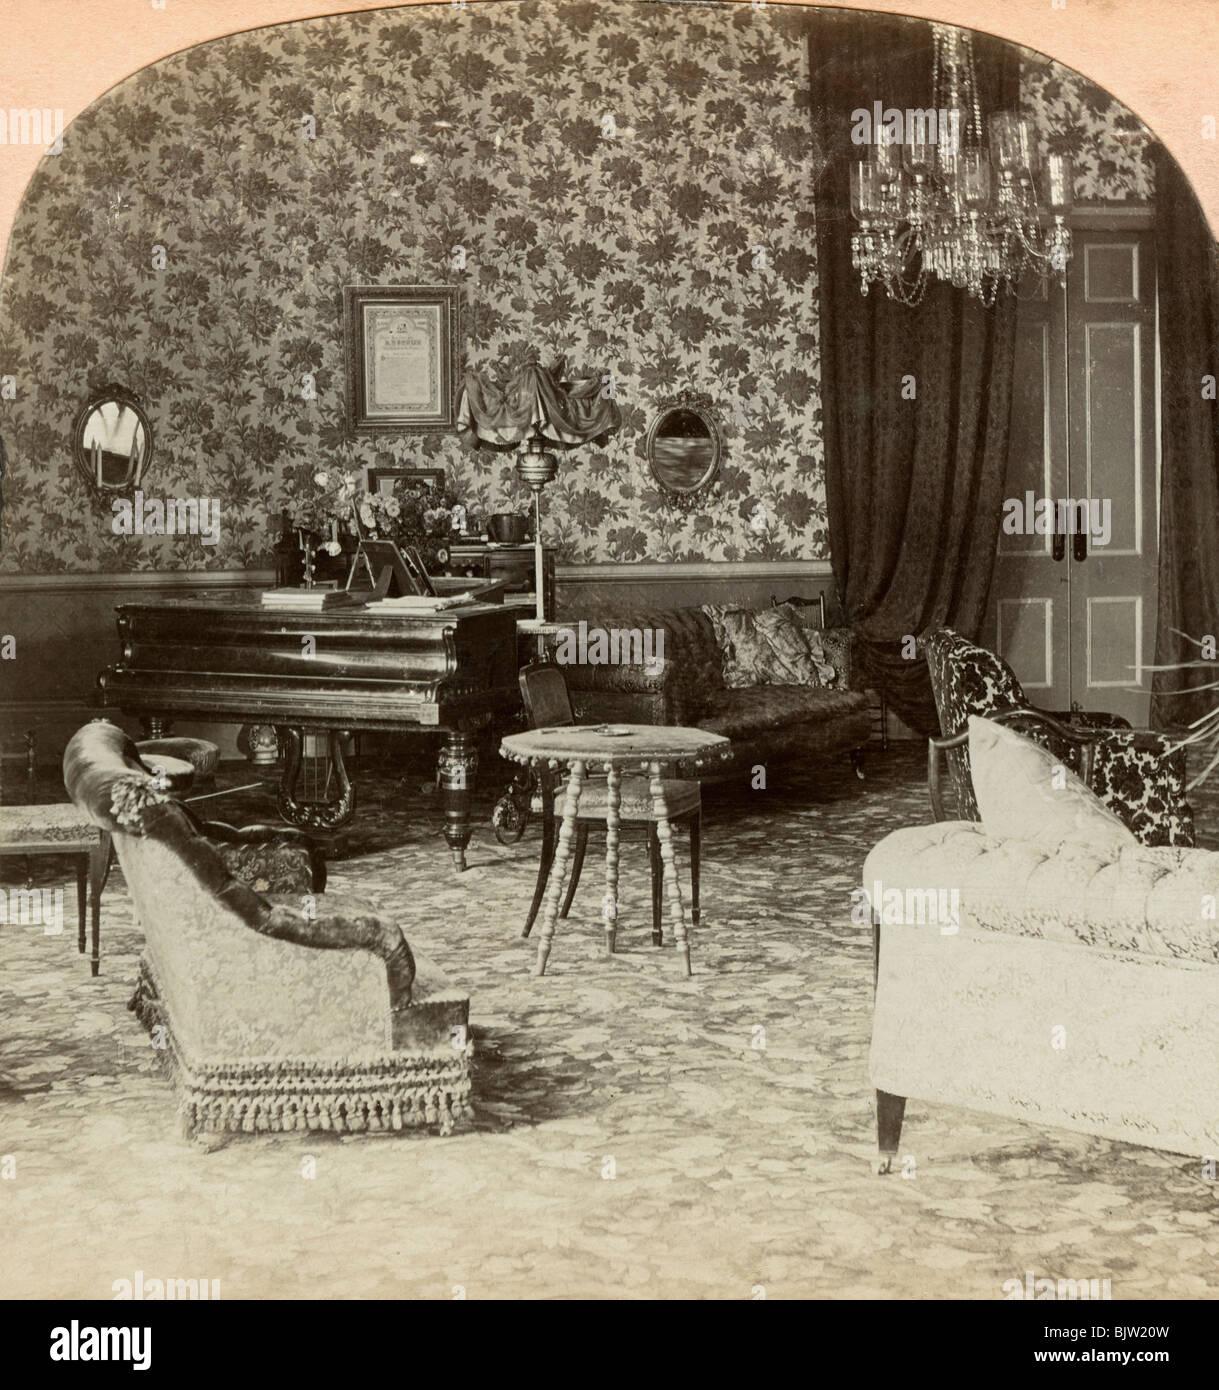 Drawing room of the Presidency, Lord Roberts' headquarters, Bloemfontein, South Africa, 1900.Artist: Keystone - Stock Image